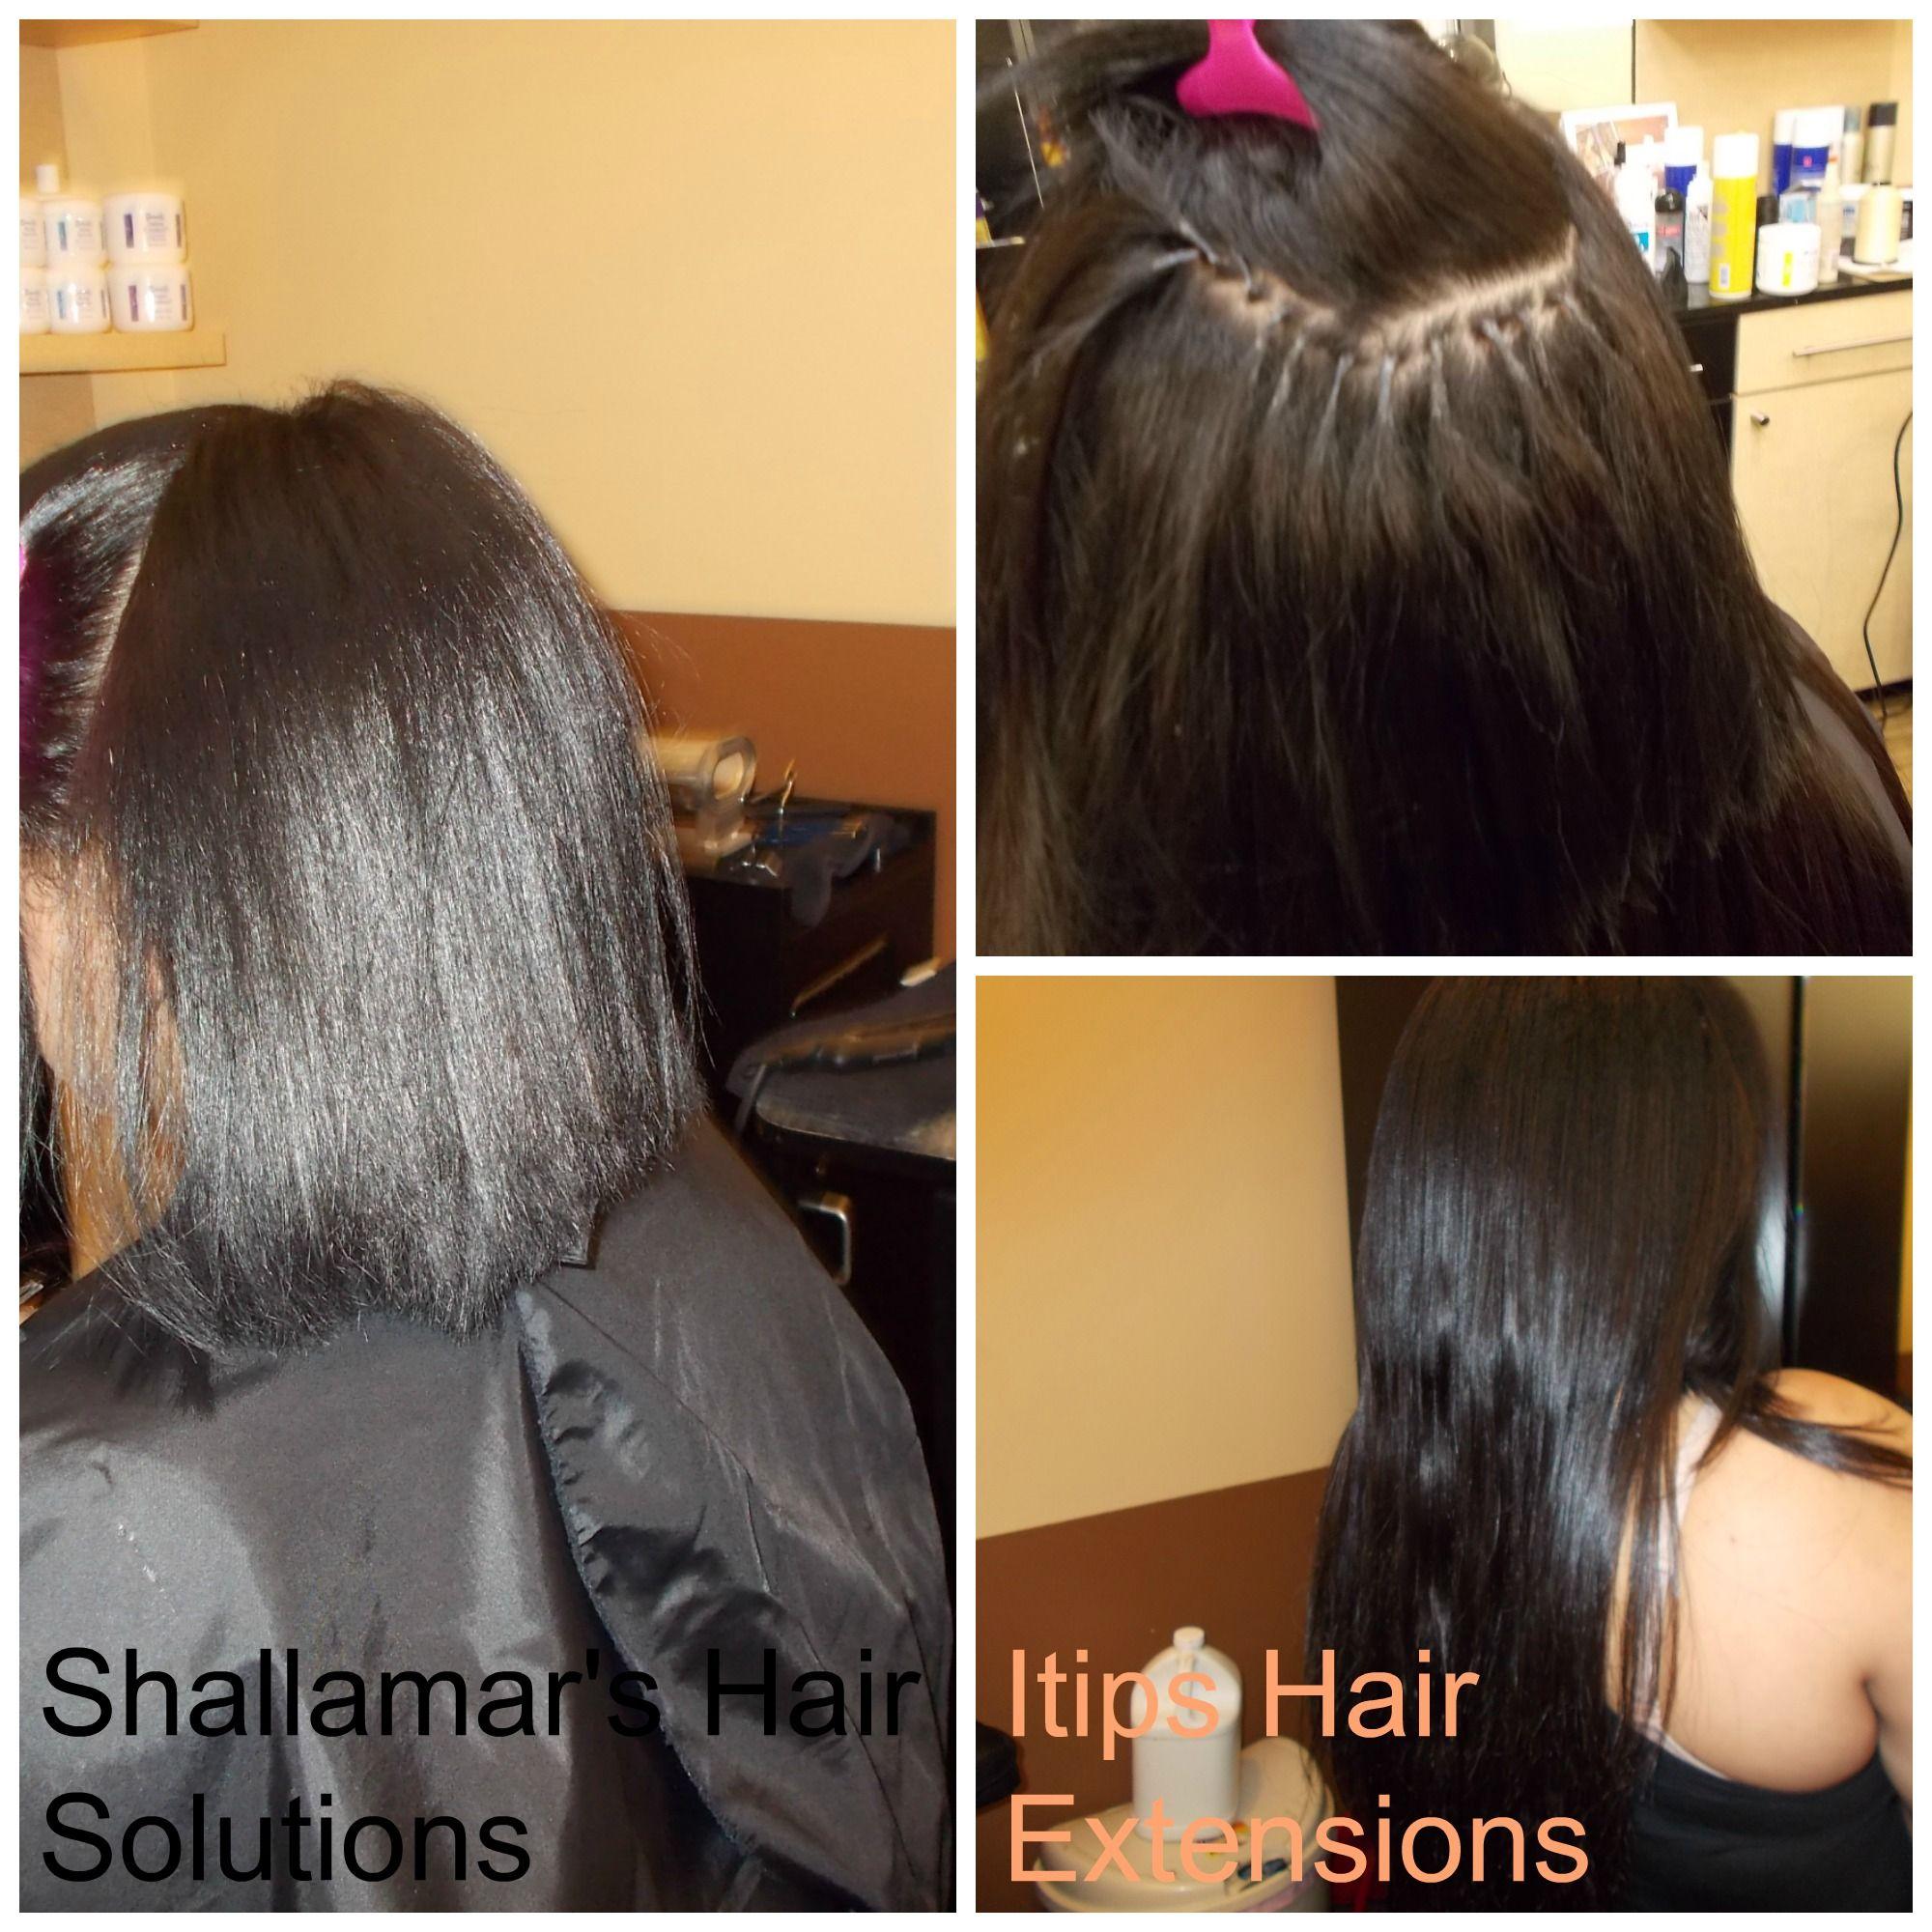 Itips Hair Extensions 407 507 3000 Shallamarshairsolutions